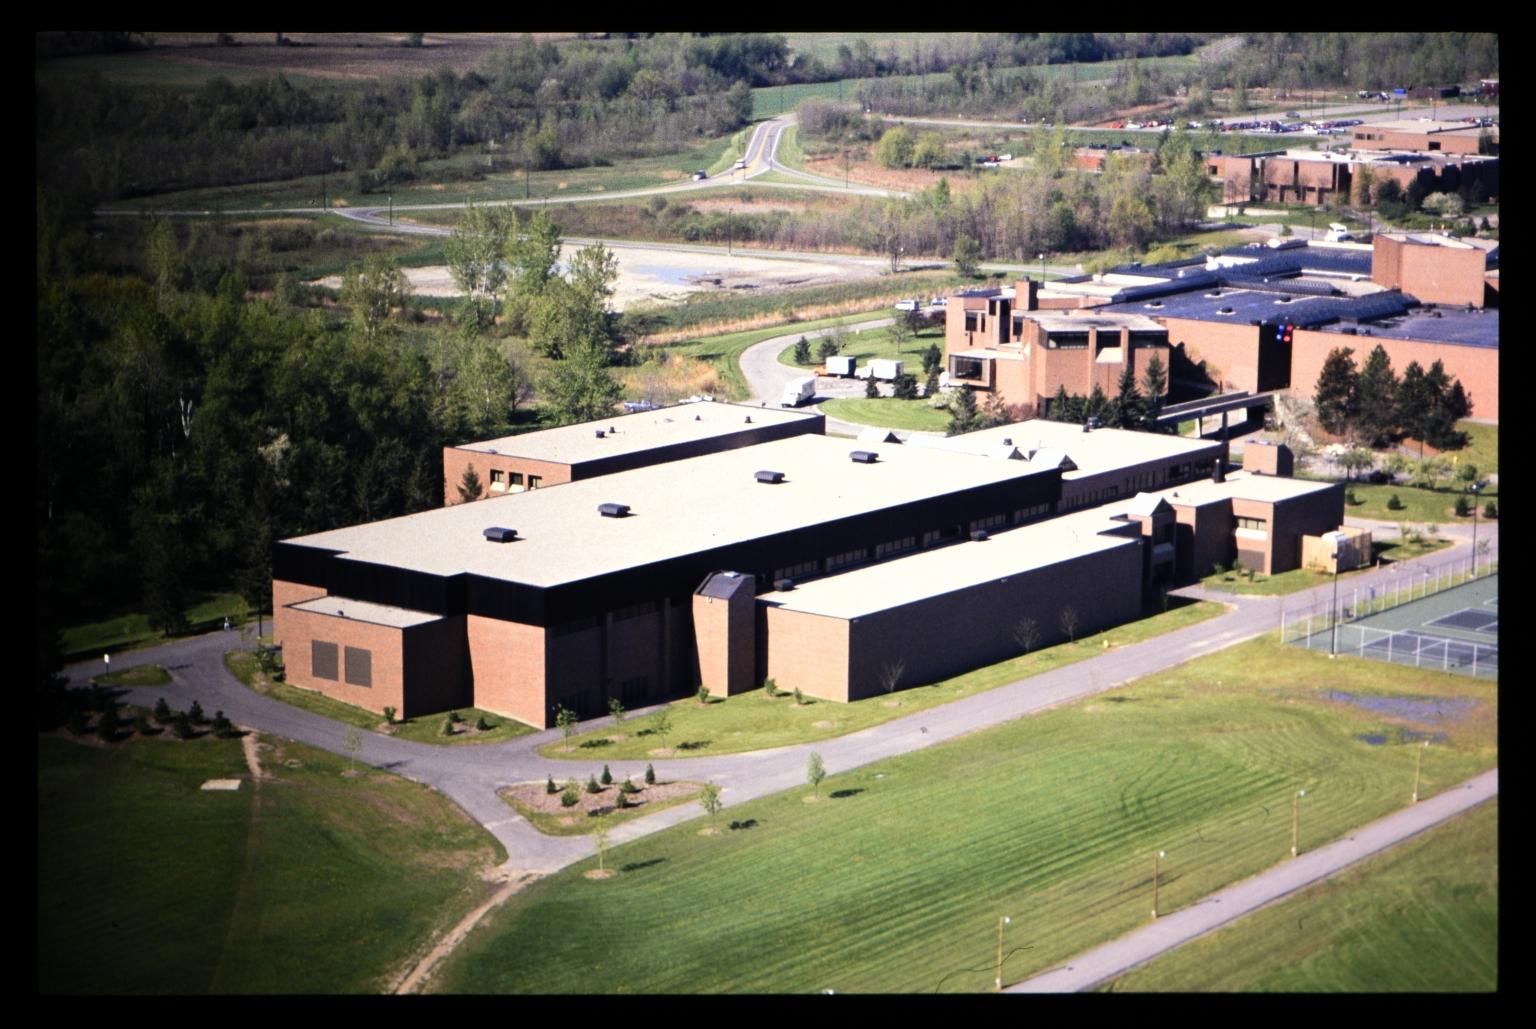 Aerial view of the Henrietta campus